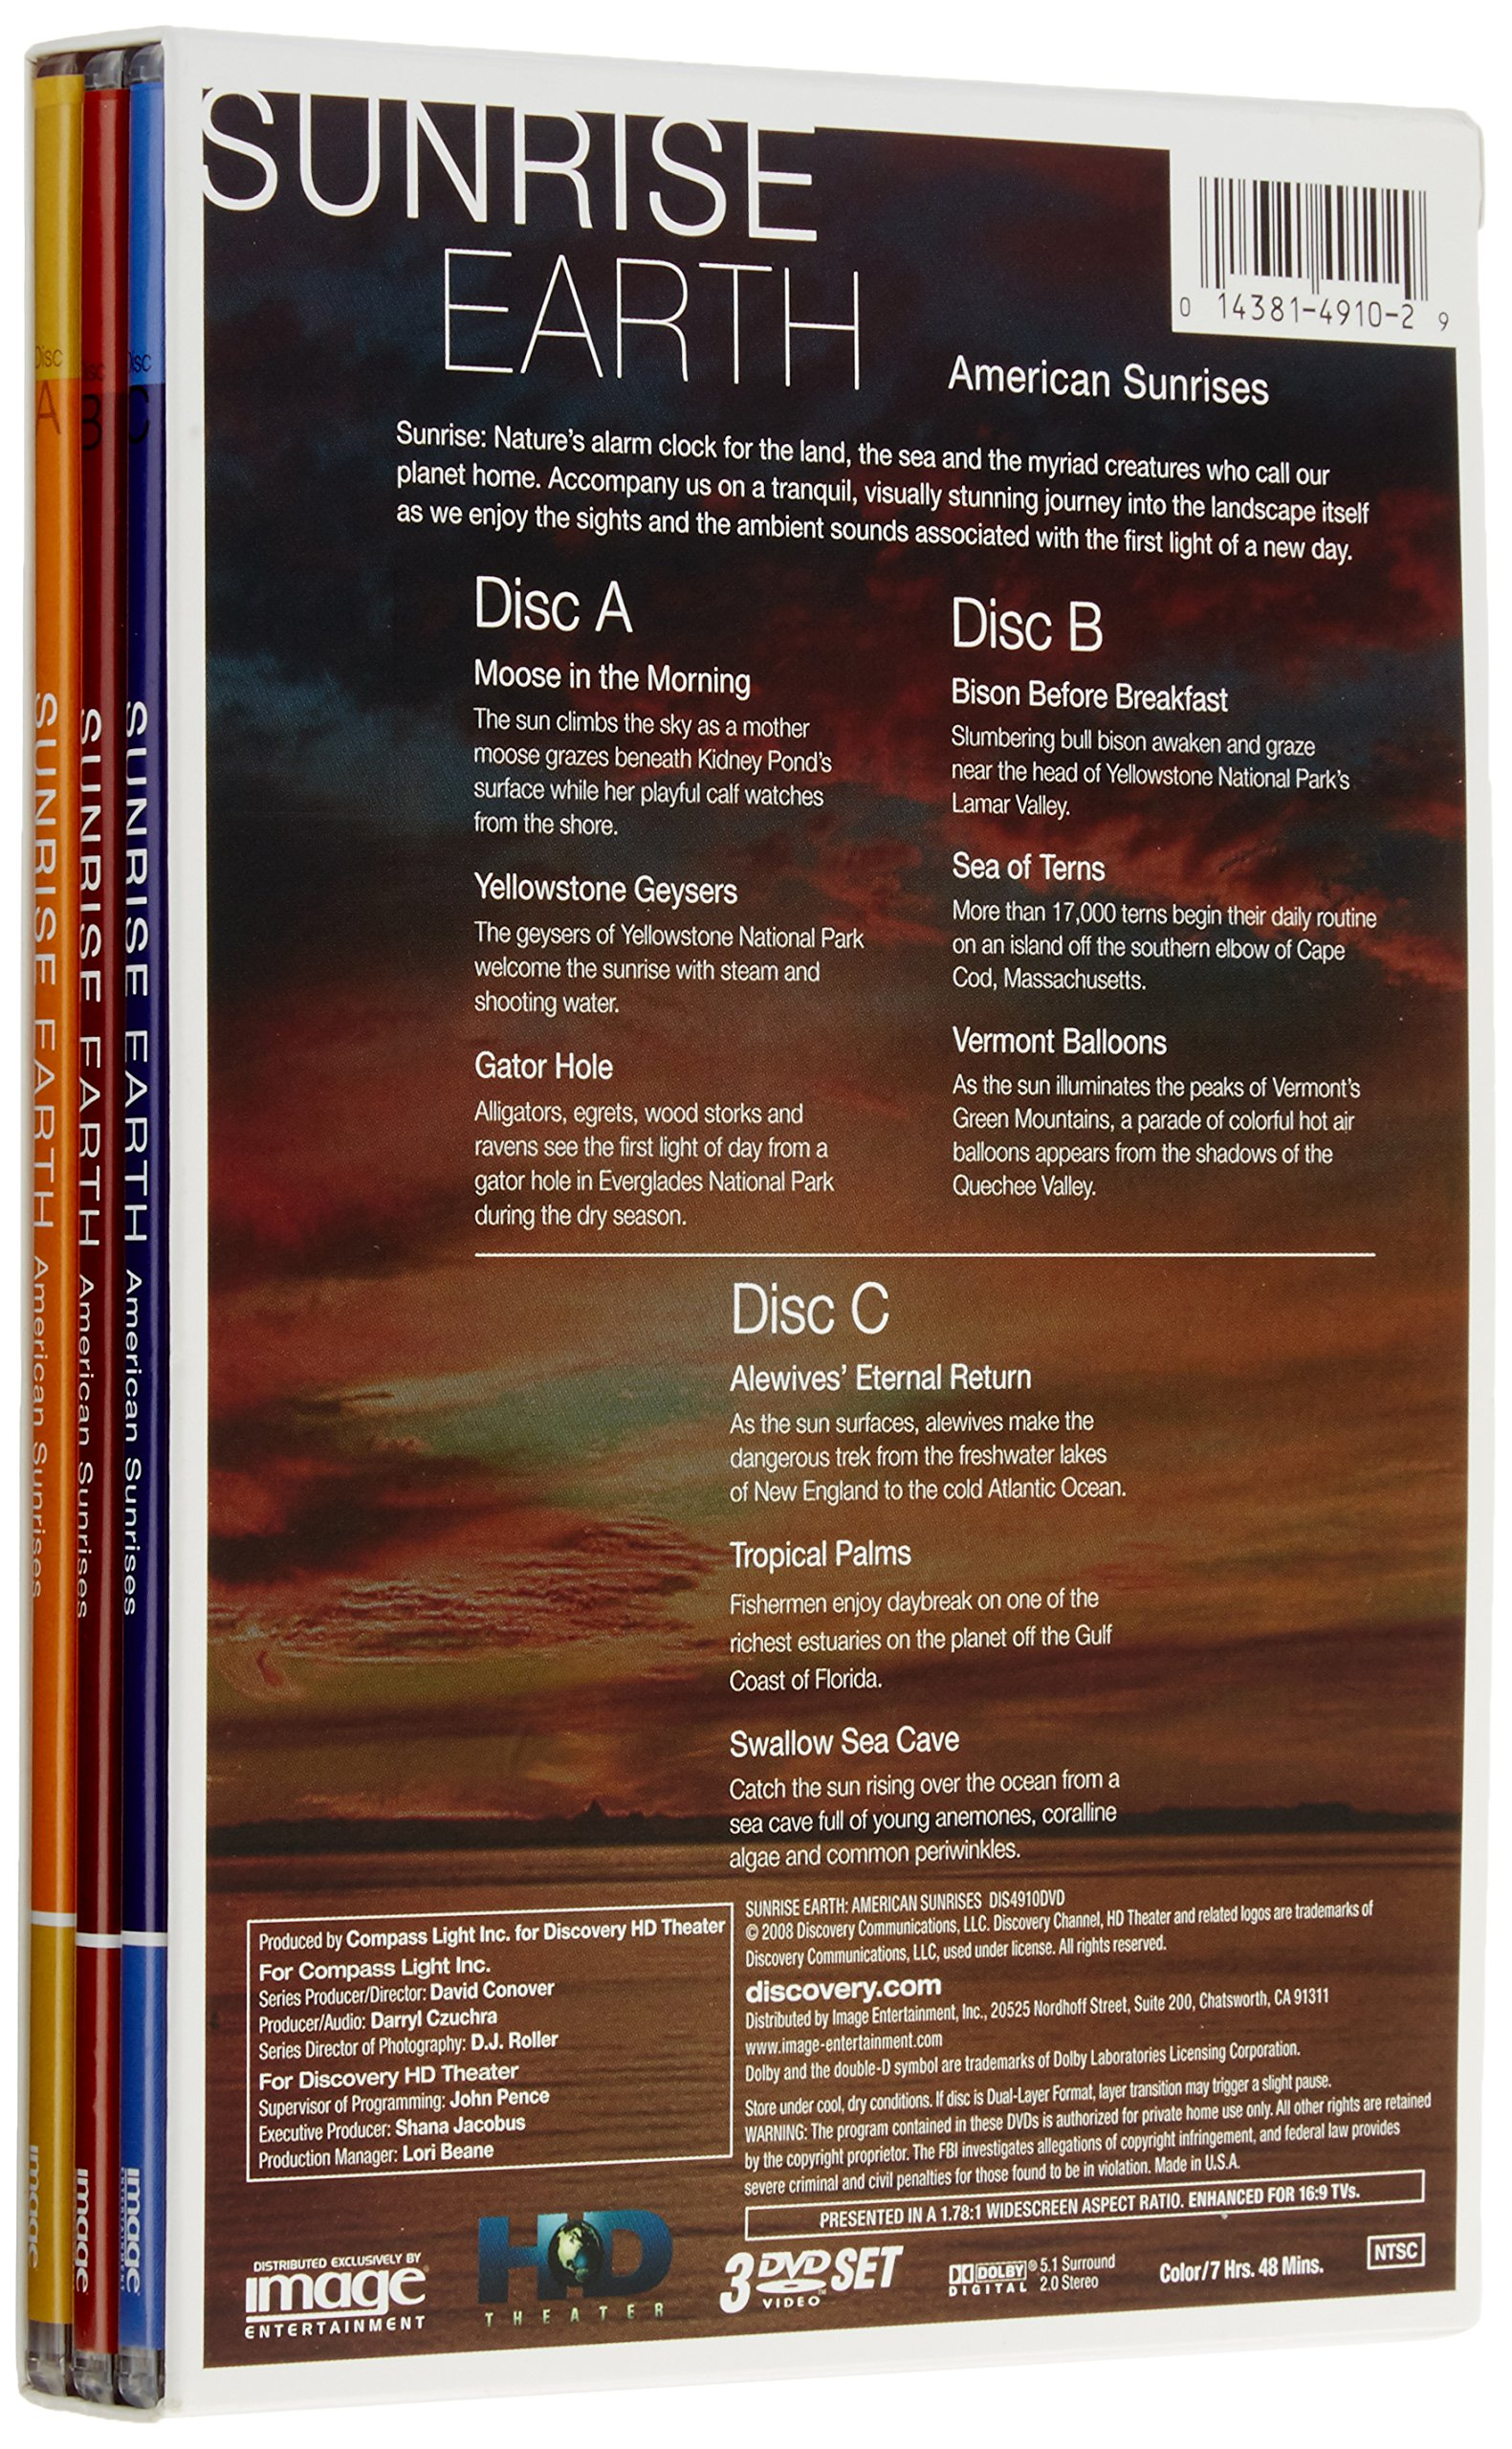 Sunrise Earth: American Sunrises